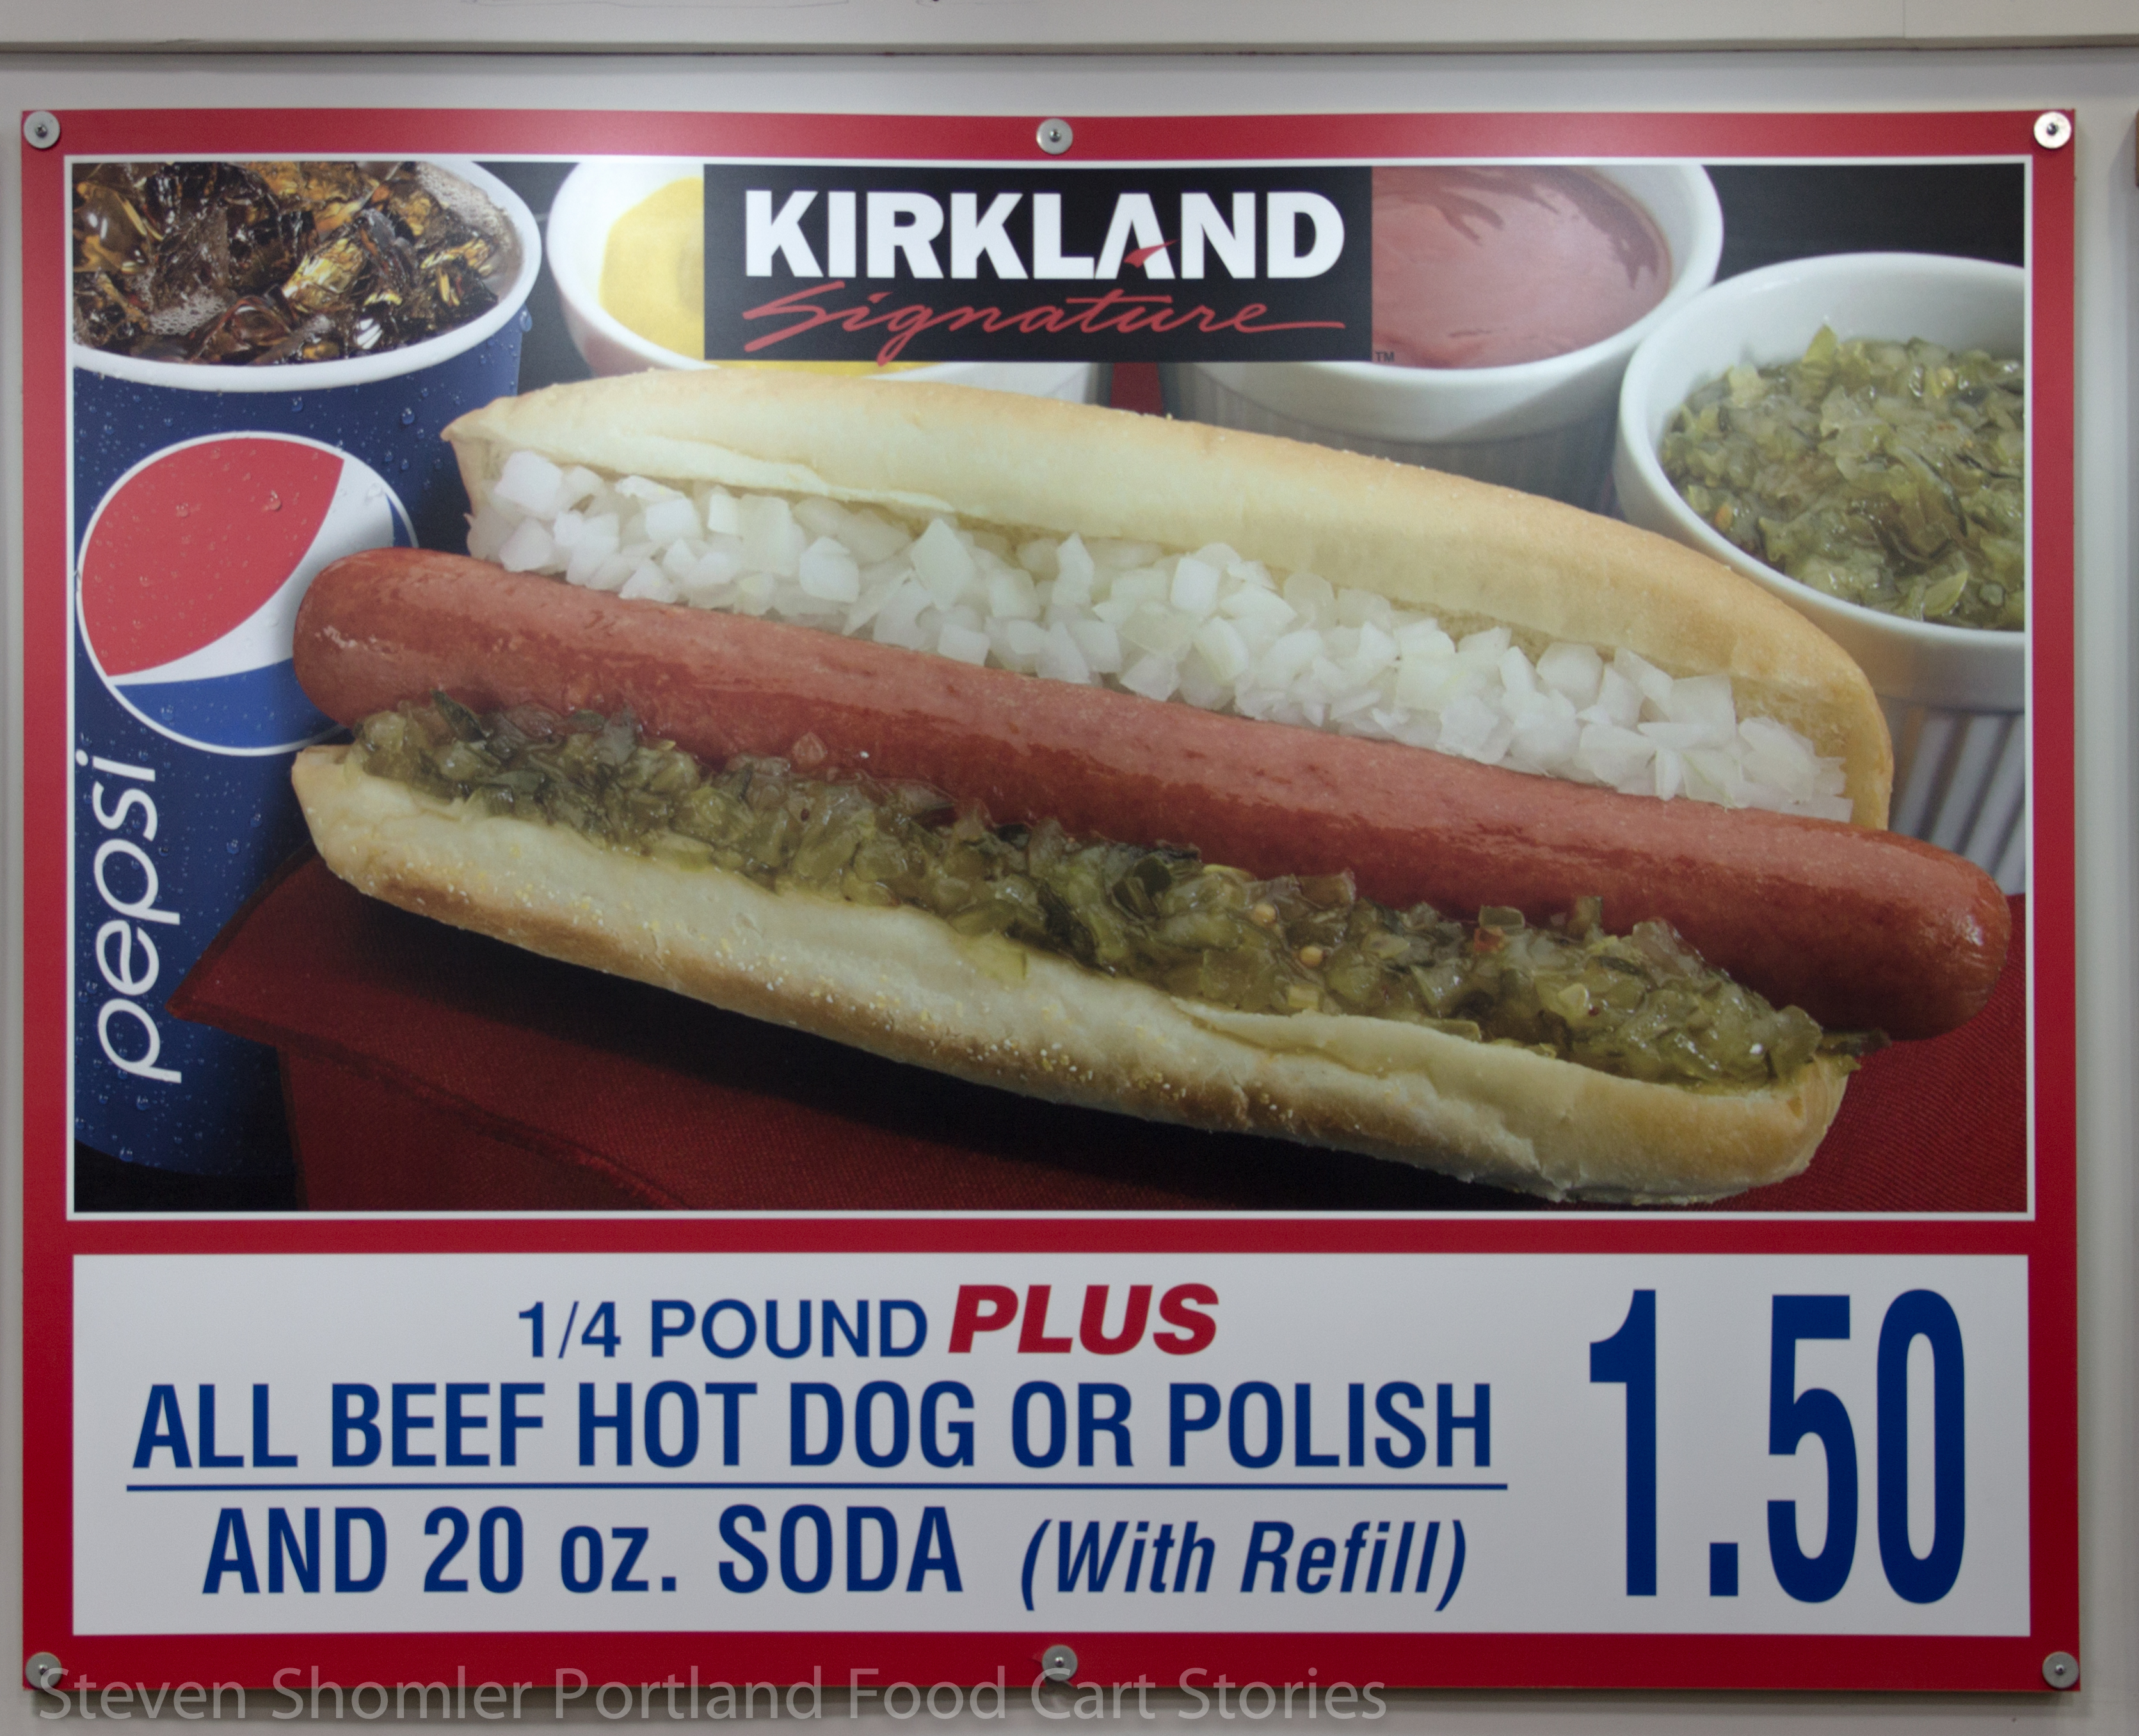 portland-food-cart-stories-costco-tigard-book-signing-6.jpg